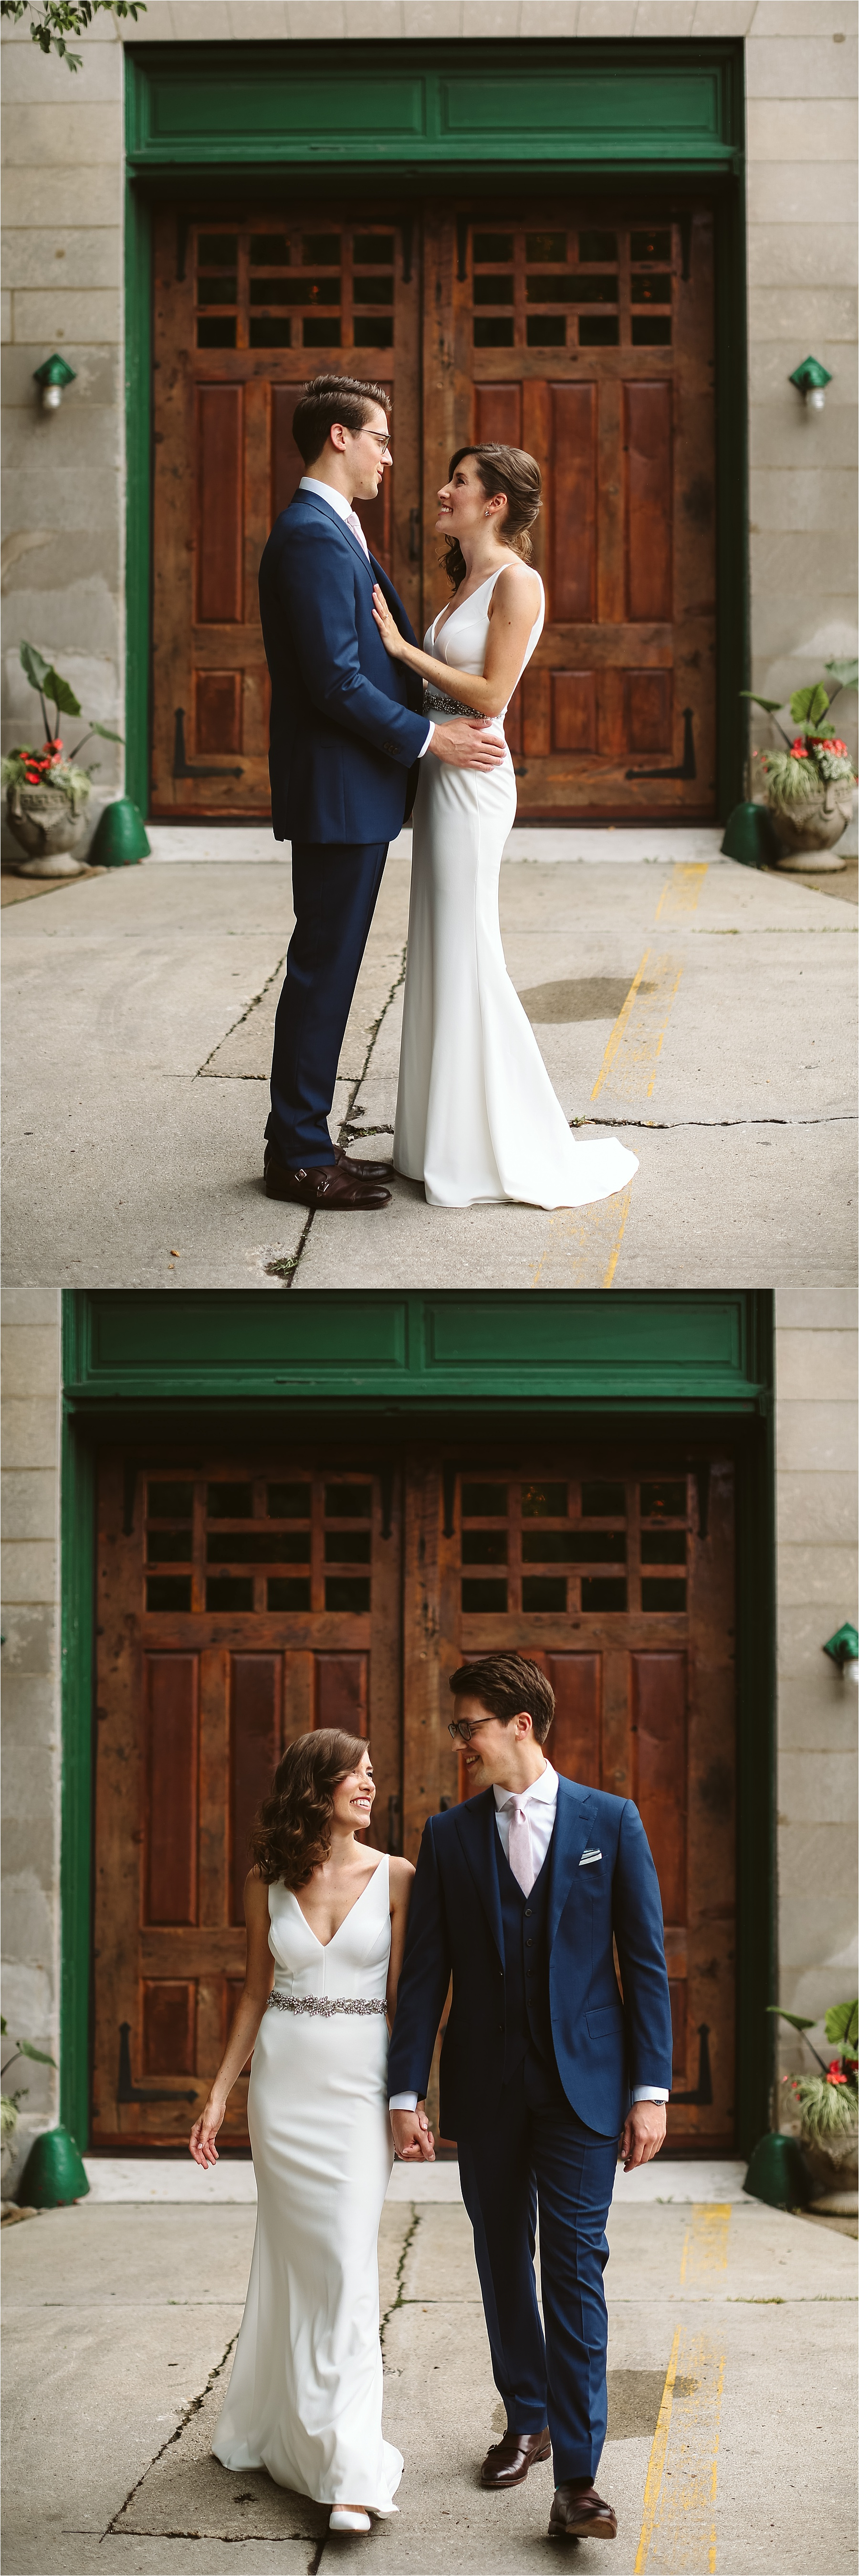 Intimate Firehouse Chicago Wedding_0011.jpg